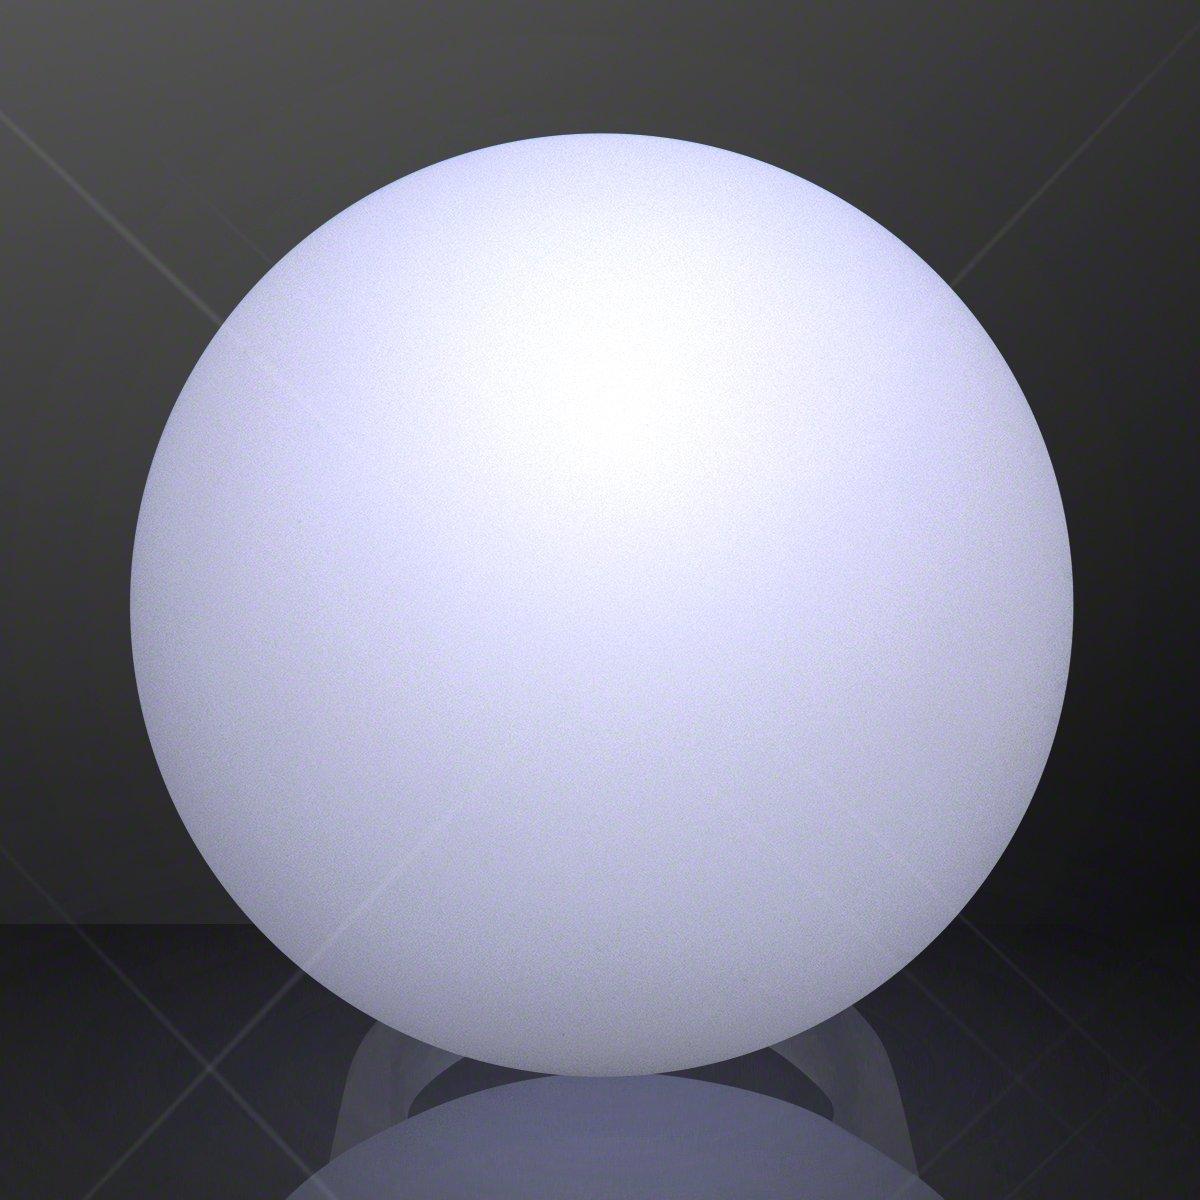 FlashingBlinkyLights White Magic Orb LED Deco Ball Ring (Set of 12) by FlashingBlinkyLights (Image #4)